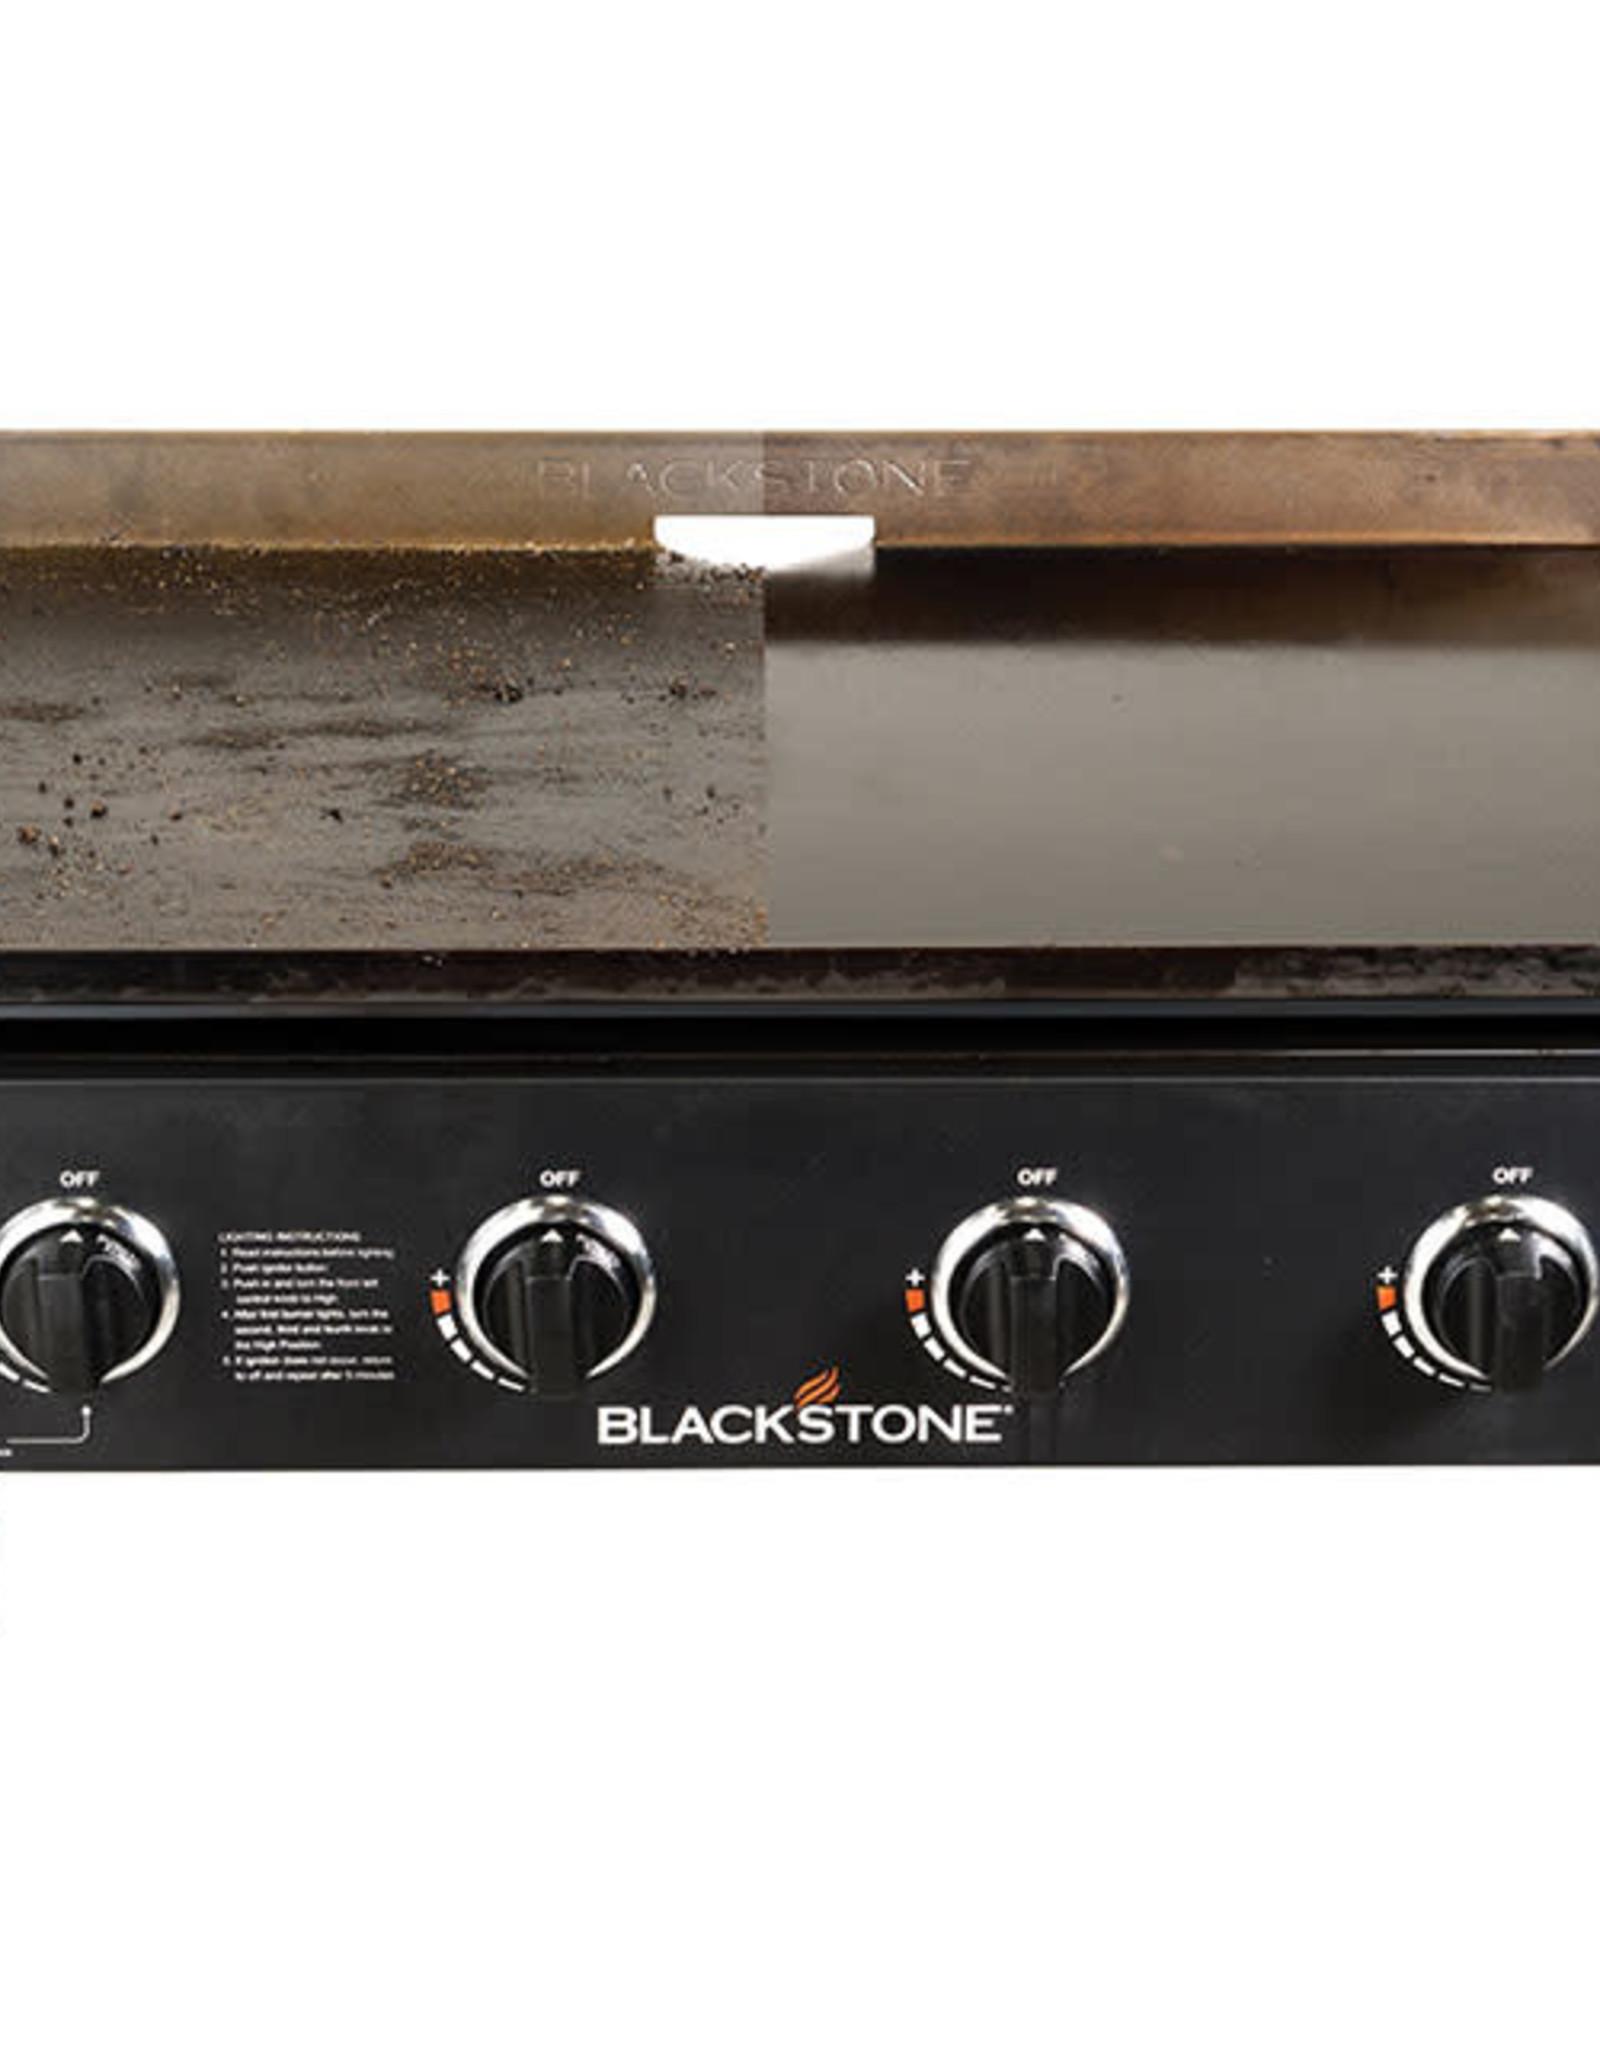 Blackstone Blackstone Cleaning Kit 5059